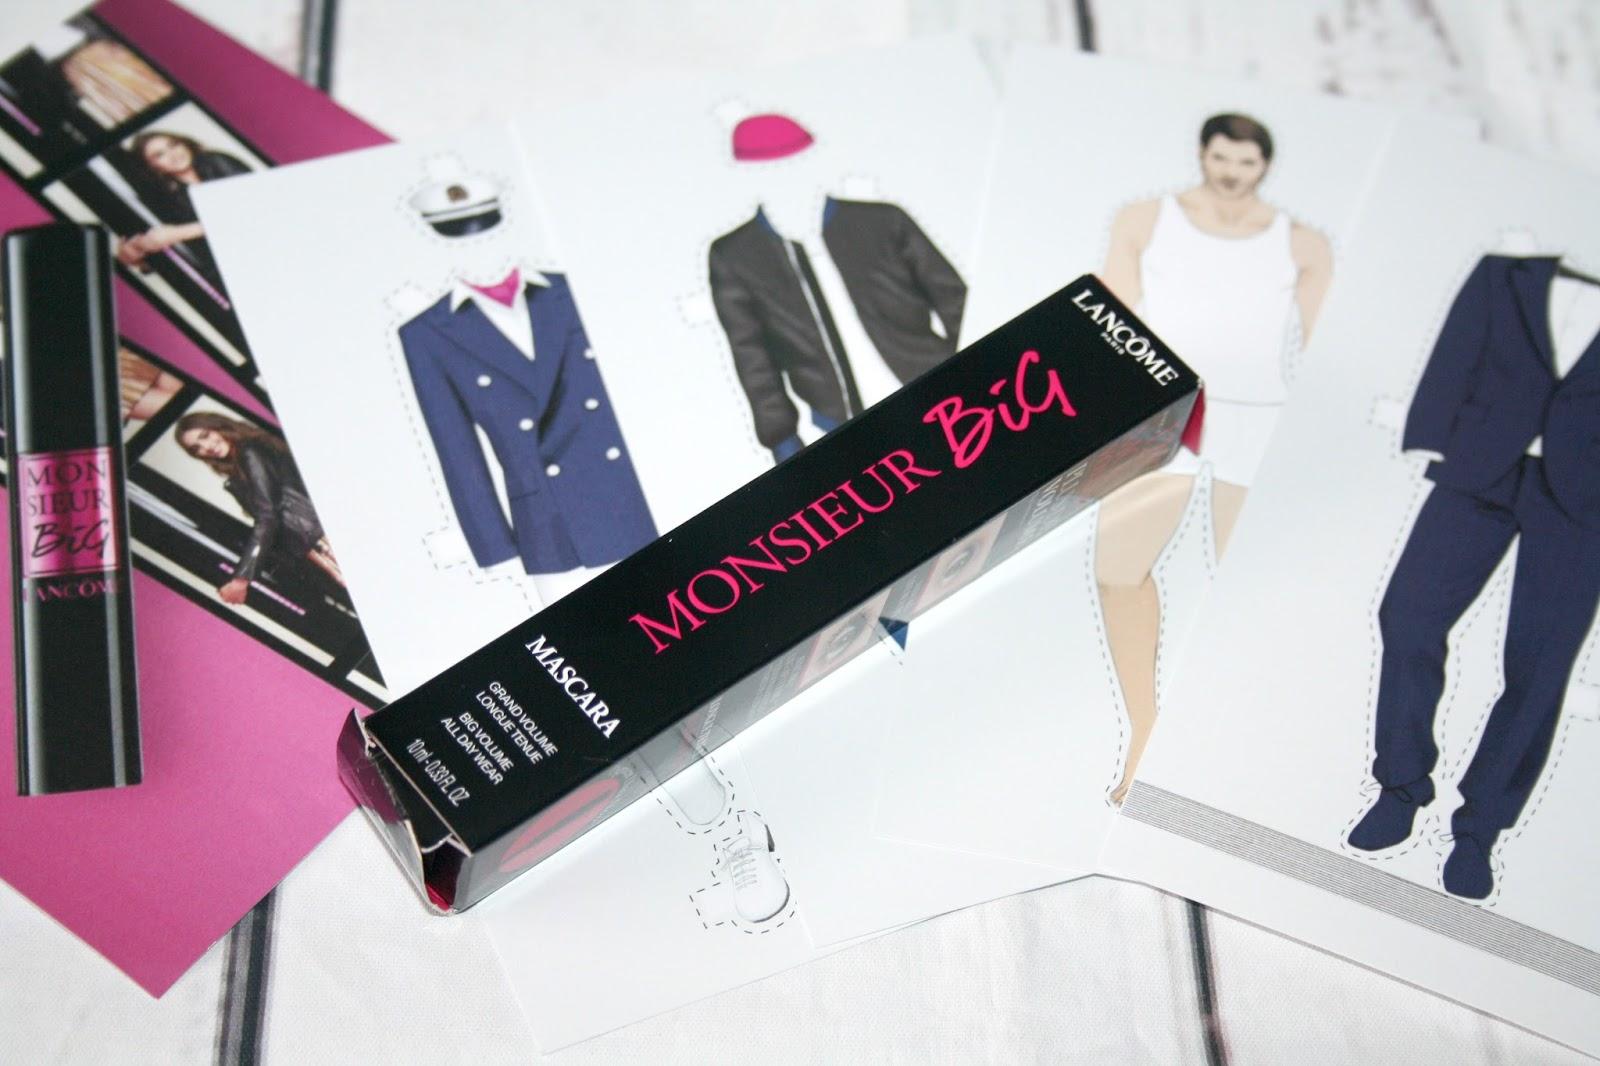 f10a5f74351 Lancôme Monsieur Big Mascara   Beauty Queen UK   Bloglovin'